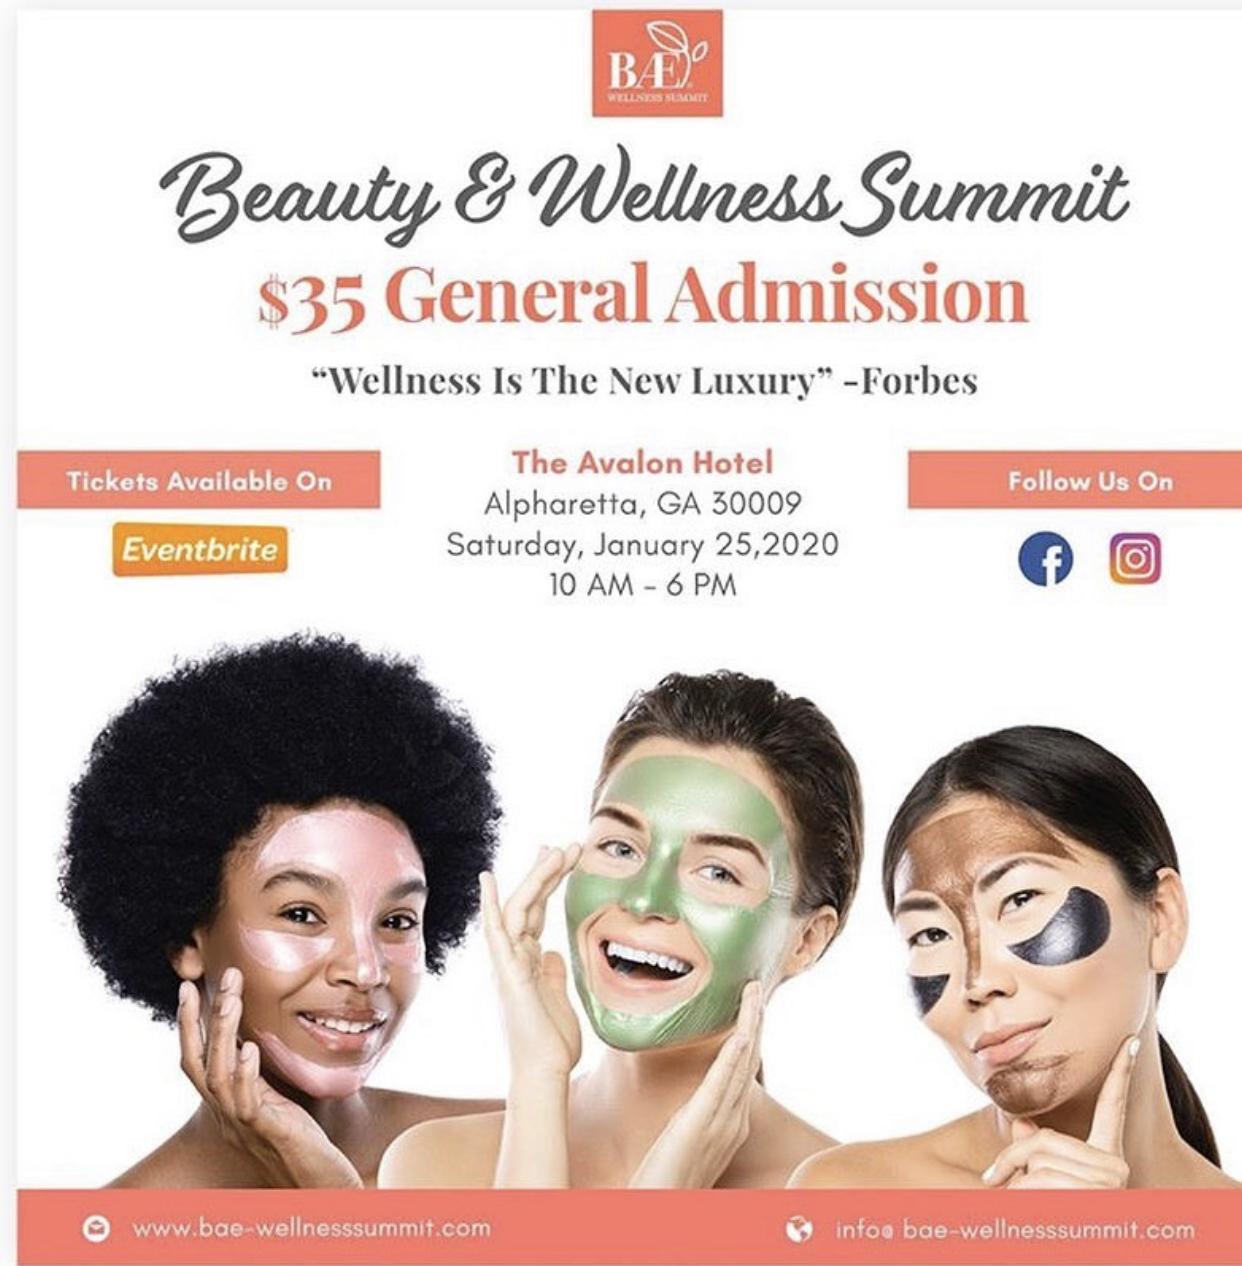 BAE Beauty & Wellness Summit